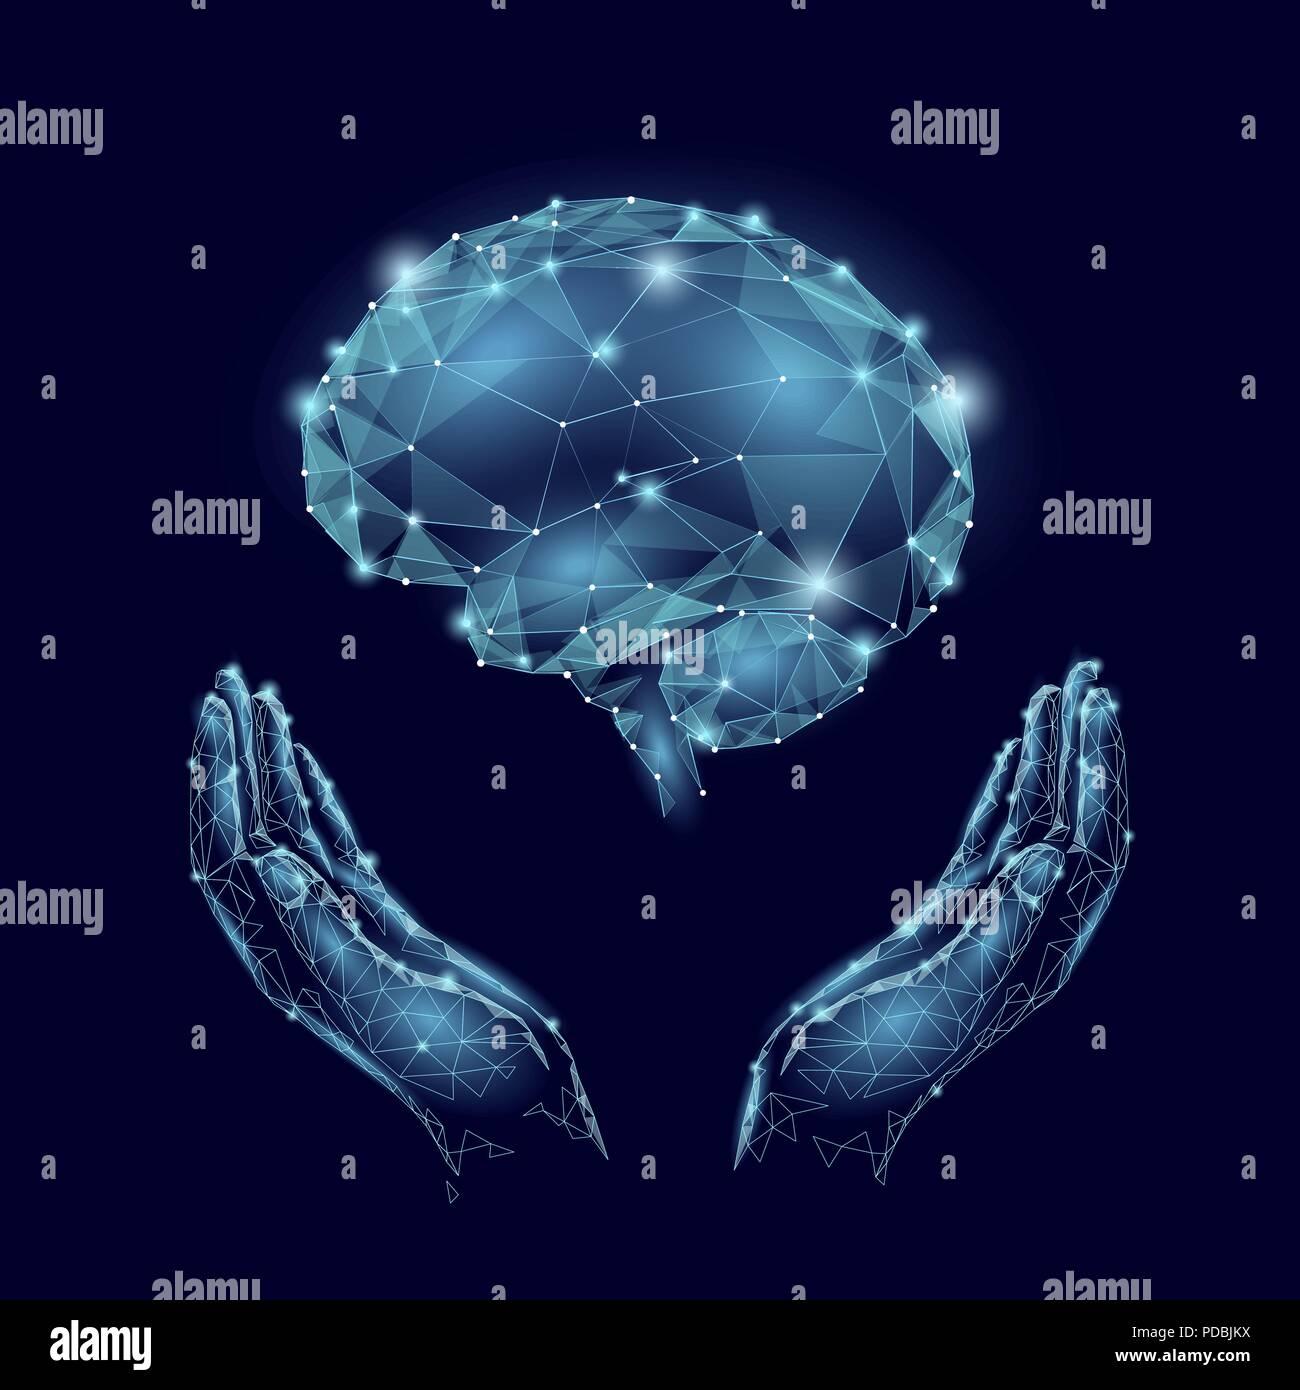 World Mental Health Day. Mood support drug therapy medical care. Sedative balance depression correction. Psychology disorder brain polygon medicine science banner vector illustration - Stock Image